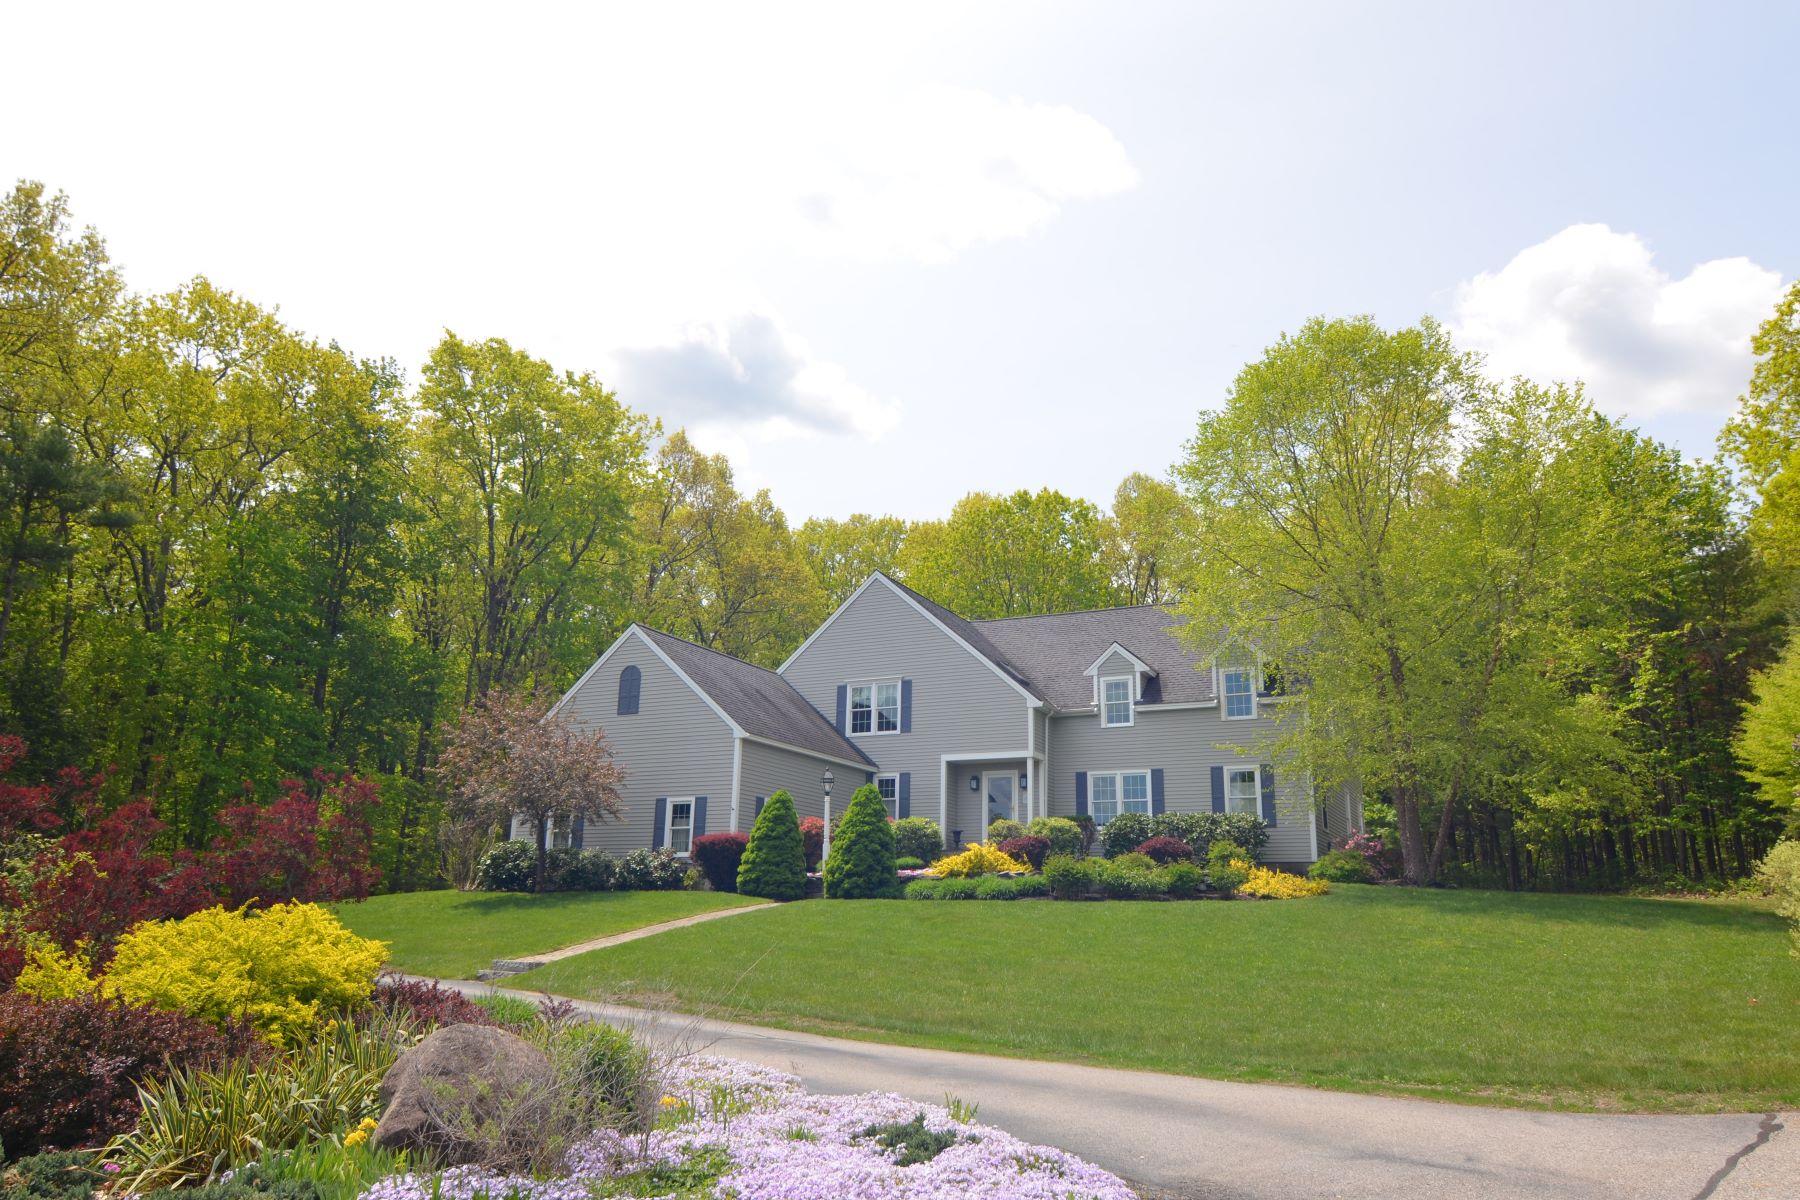 Casa para uma família para Venda às Woodlands Condominium 11 Trillium Court Lunenburg, Massachusetts, 01462 Estados Unidos